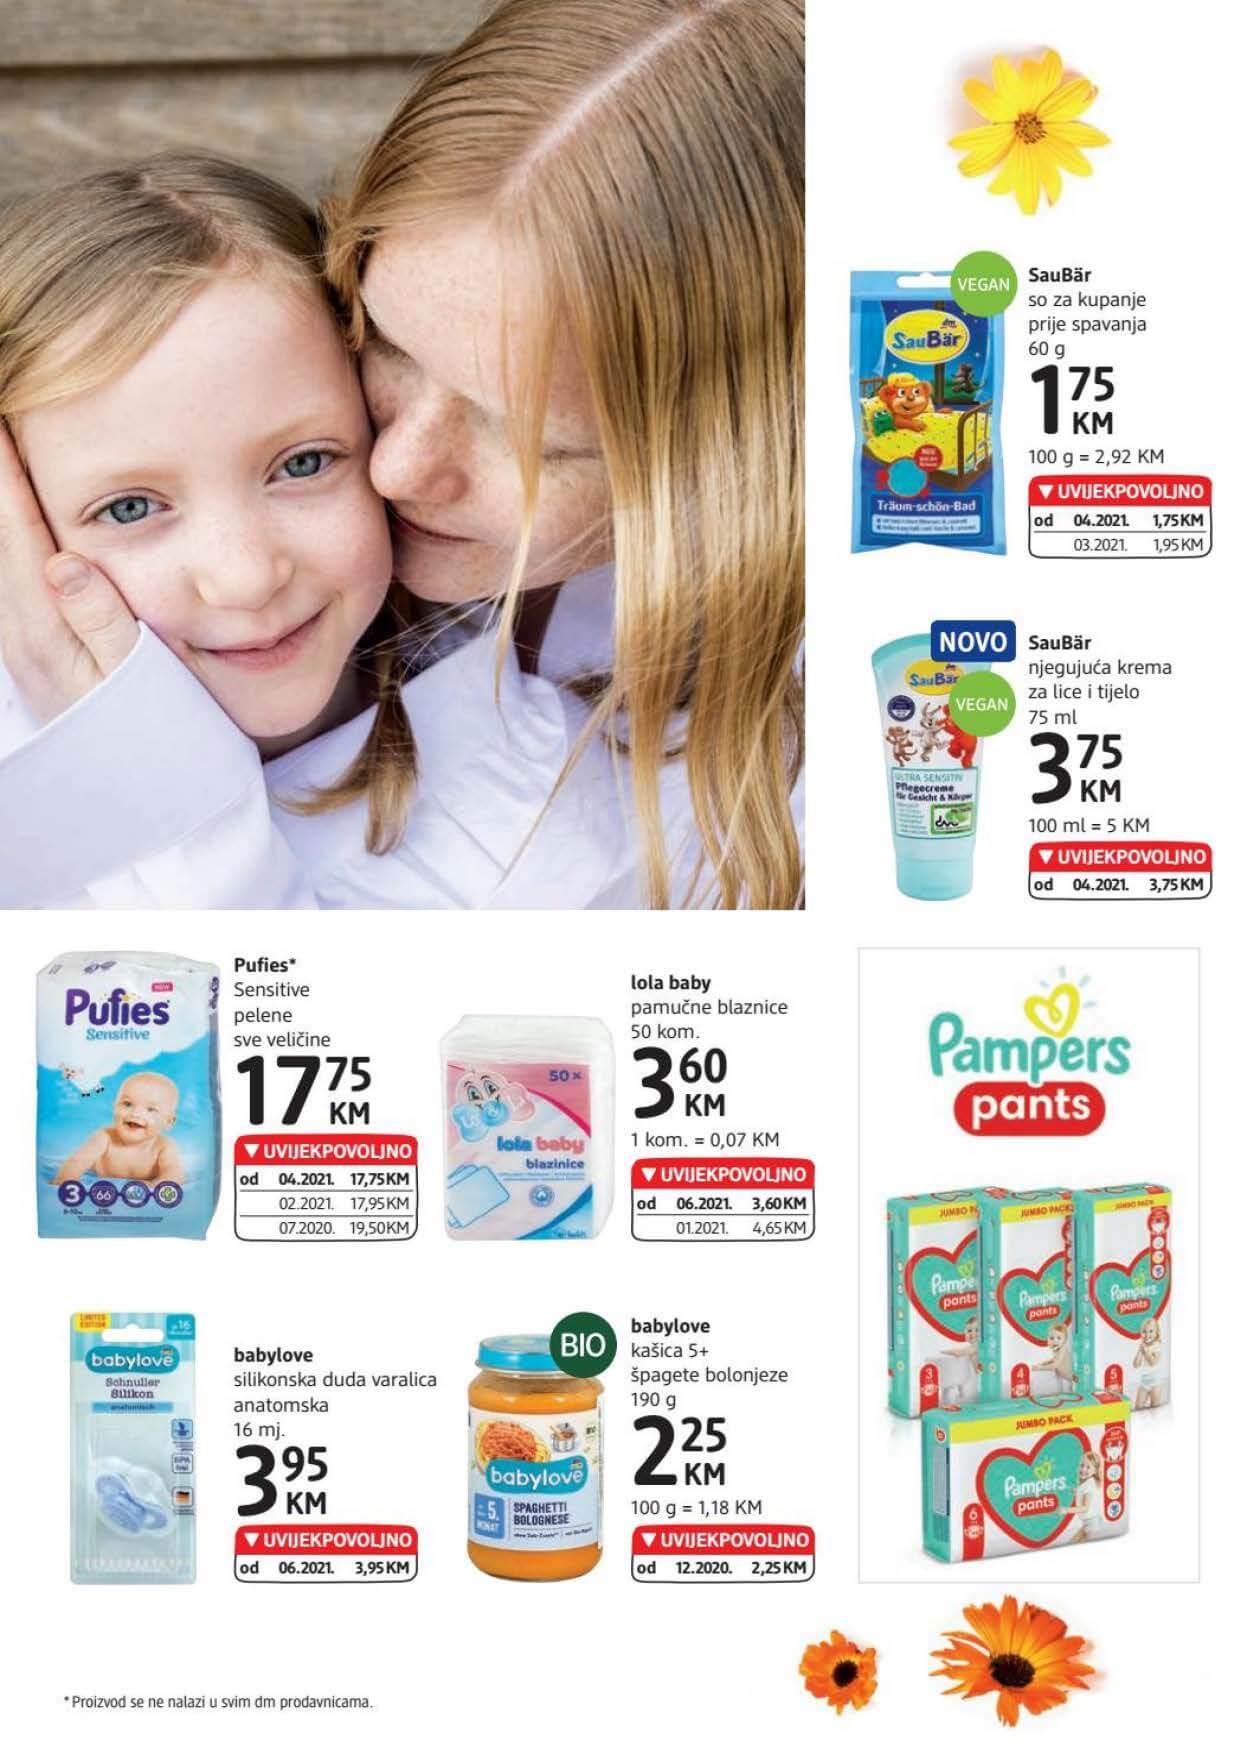 DM Katalog BiH JUN JUL 2021 23.6.2021. 6.7.2021. eKatalozi.com PR Page 20